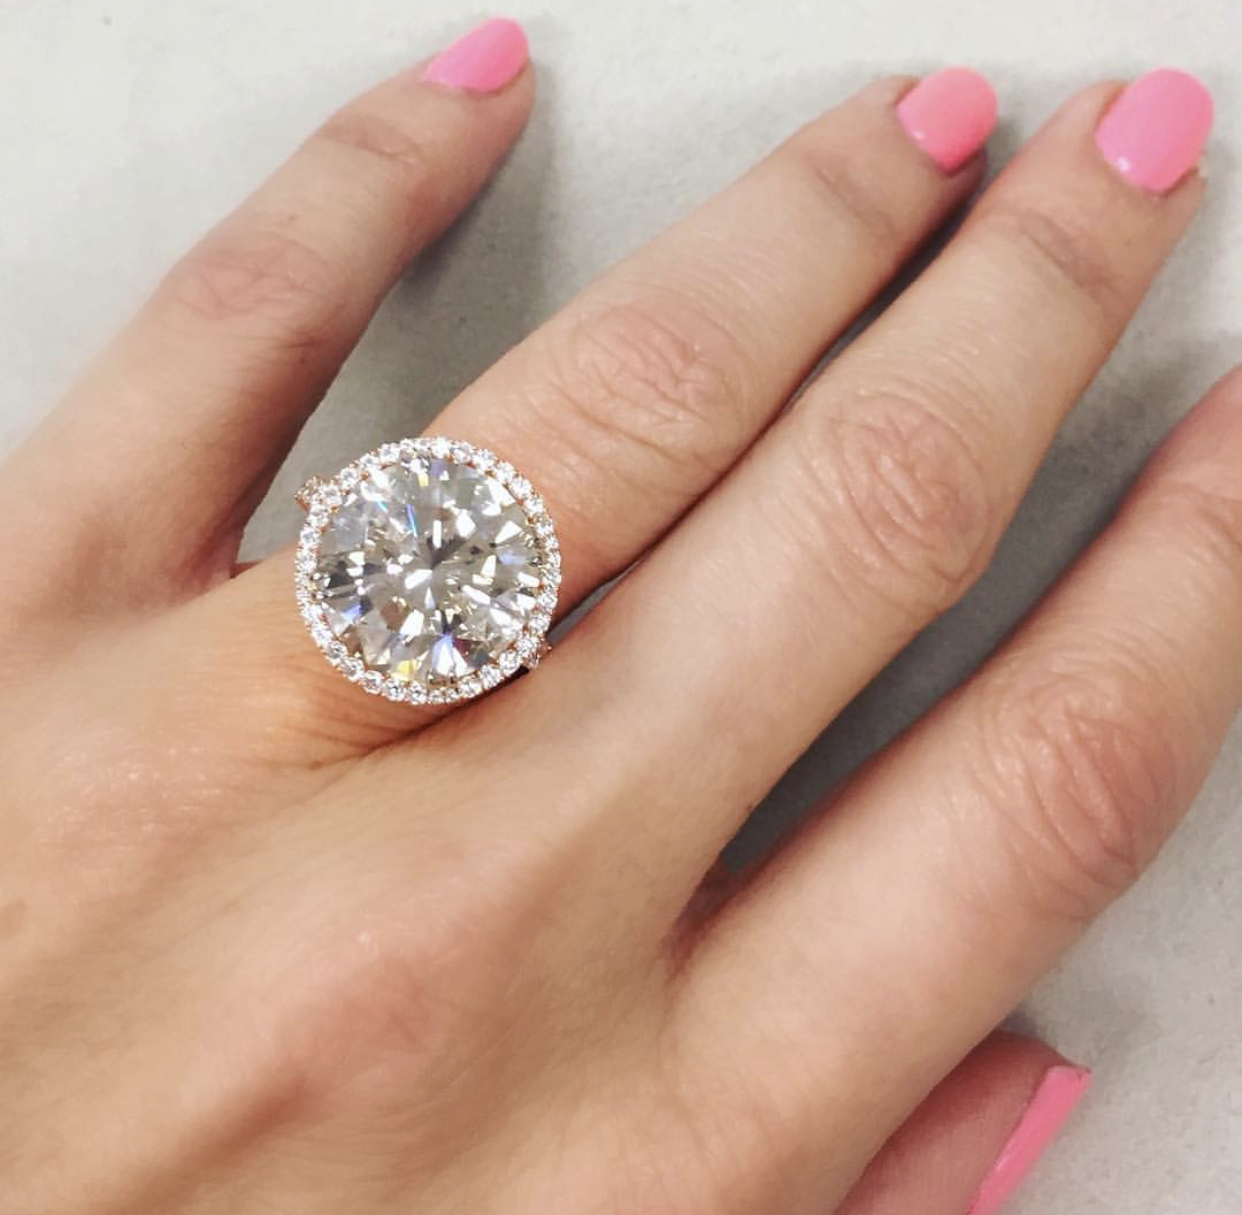 Miss Diamond Ring Engagement Ring Concierge Diamond Concierge Hand drawn doodle wedding hand drawn love vector set. miss diamond ring engagement ring